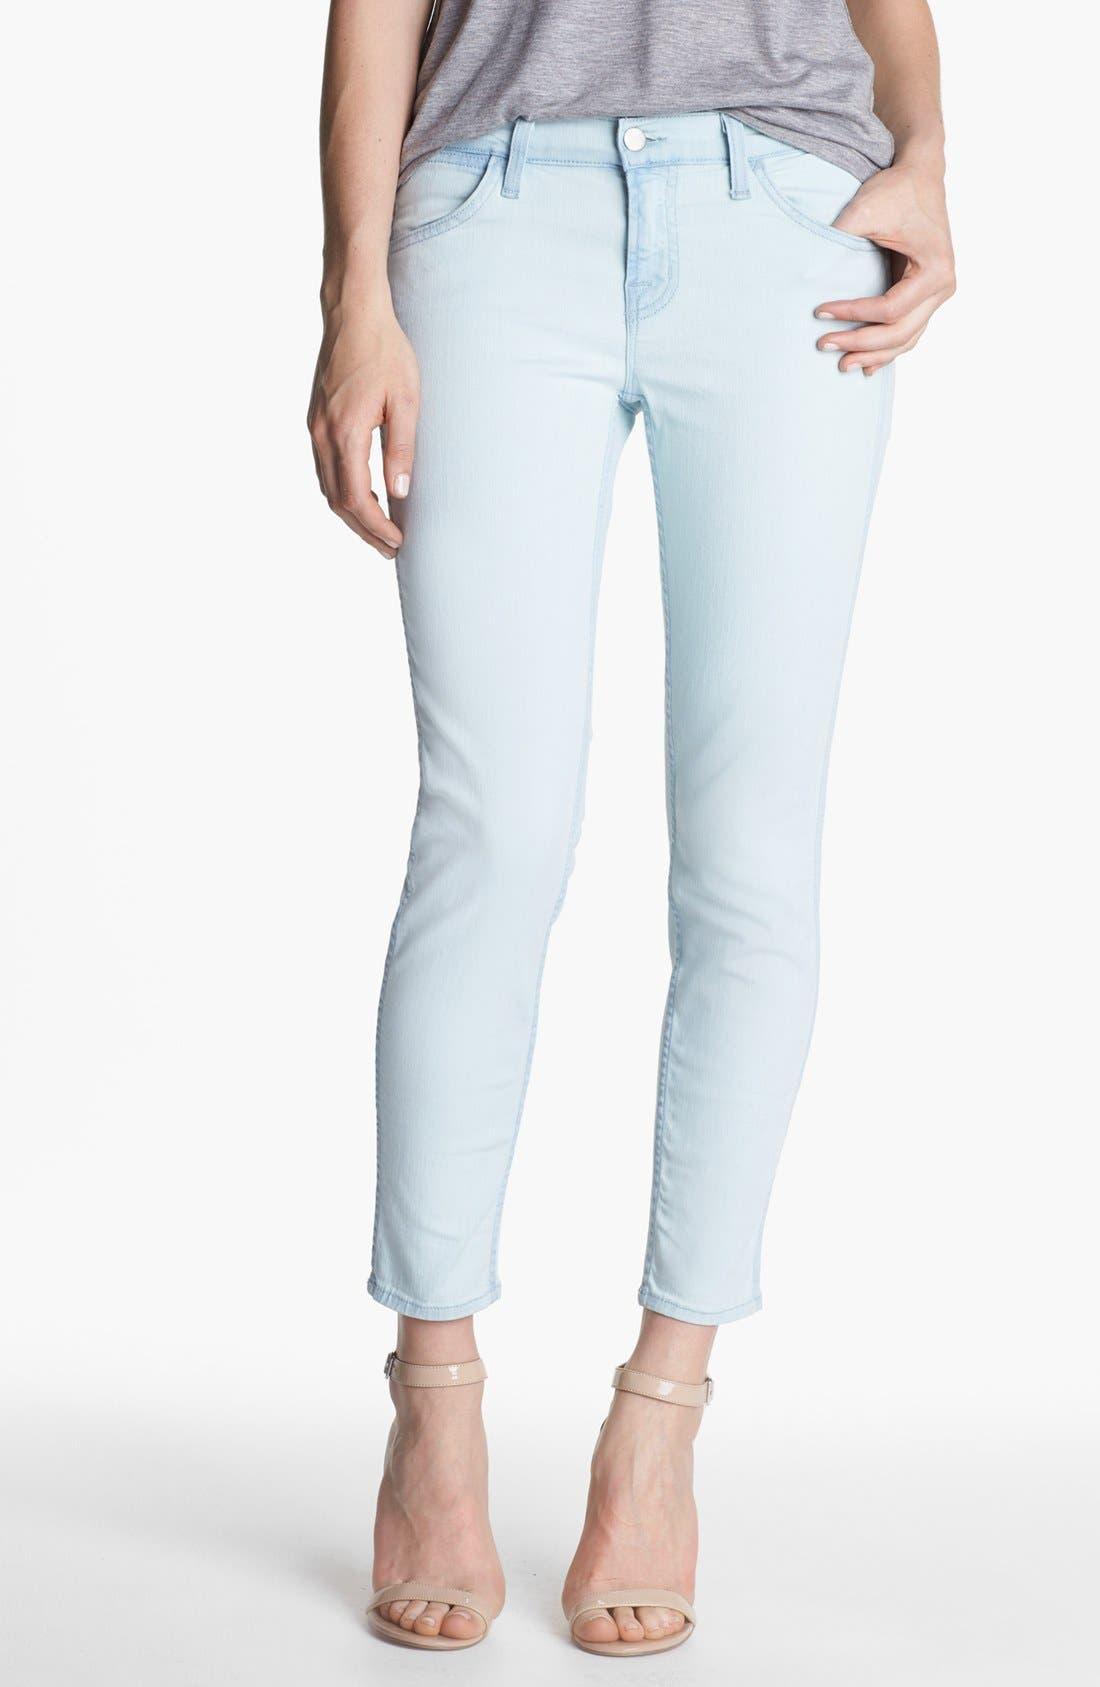 Main Image - J Brand 'Allegra' Ankle Skinny Jeans (Nirvana Sky)